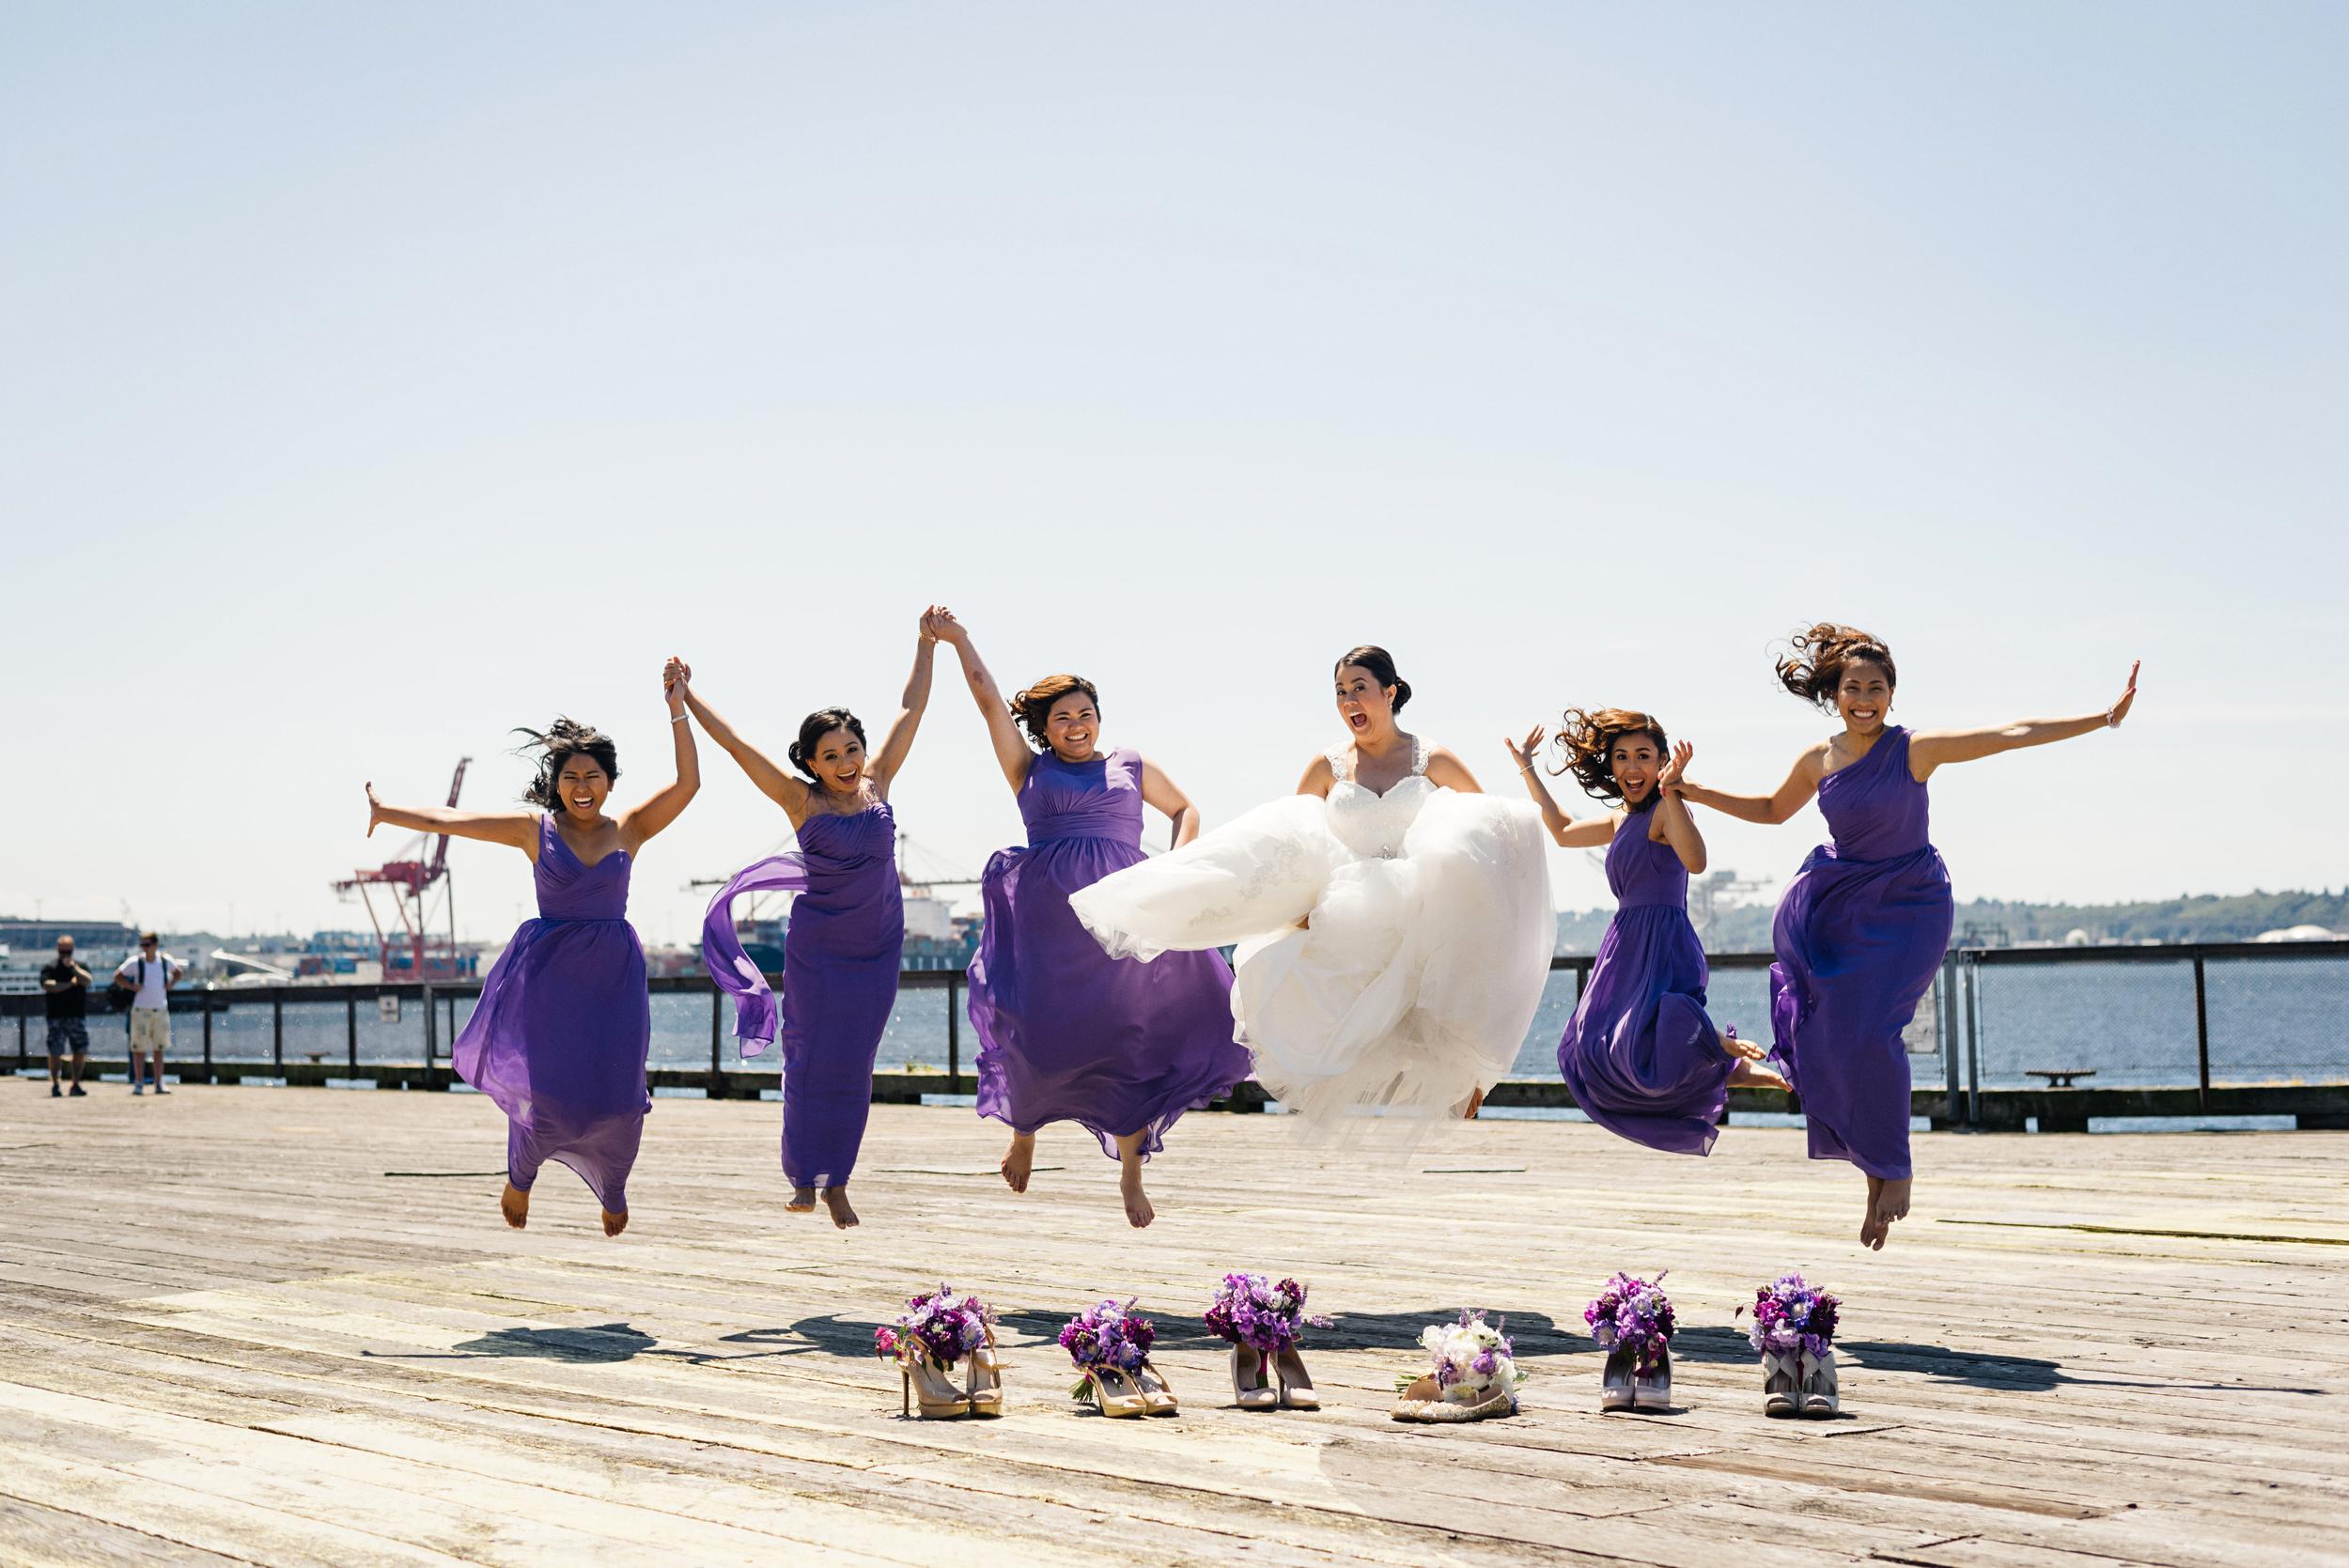 Purple Bridesmaids Dresses | Bridesmaids Jumping Photo | Joe and Patience Photography | Filipino Wedding Planner | Seattle Wedding Planner | Ballard Bay Club Wedding